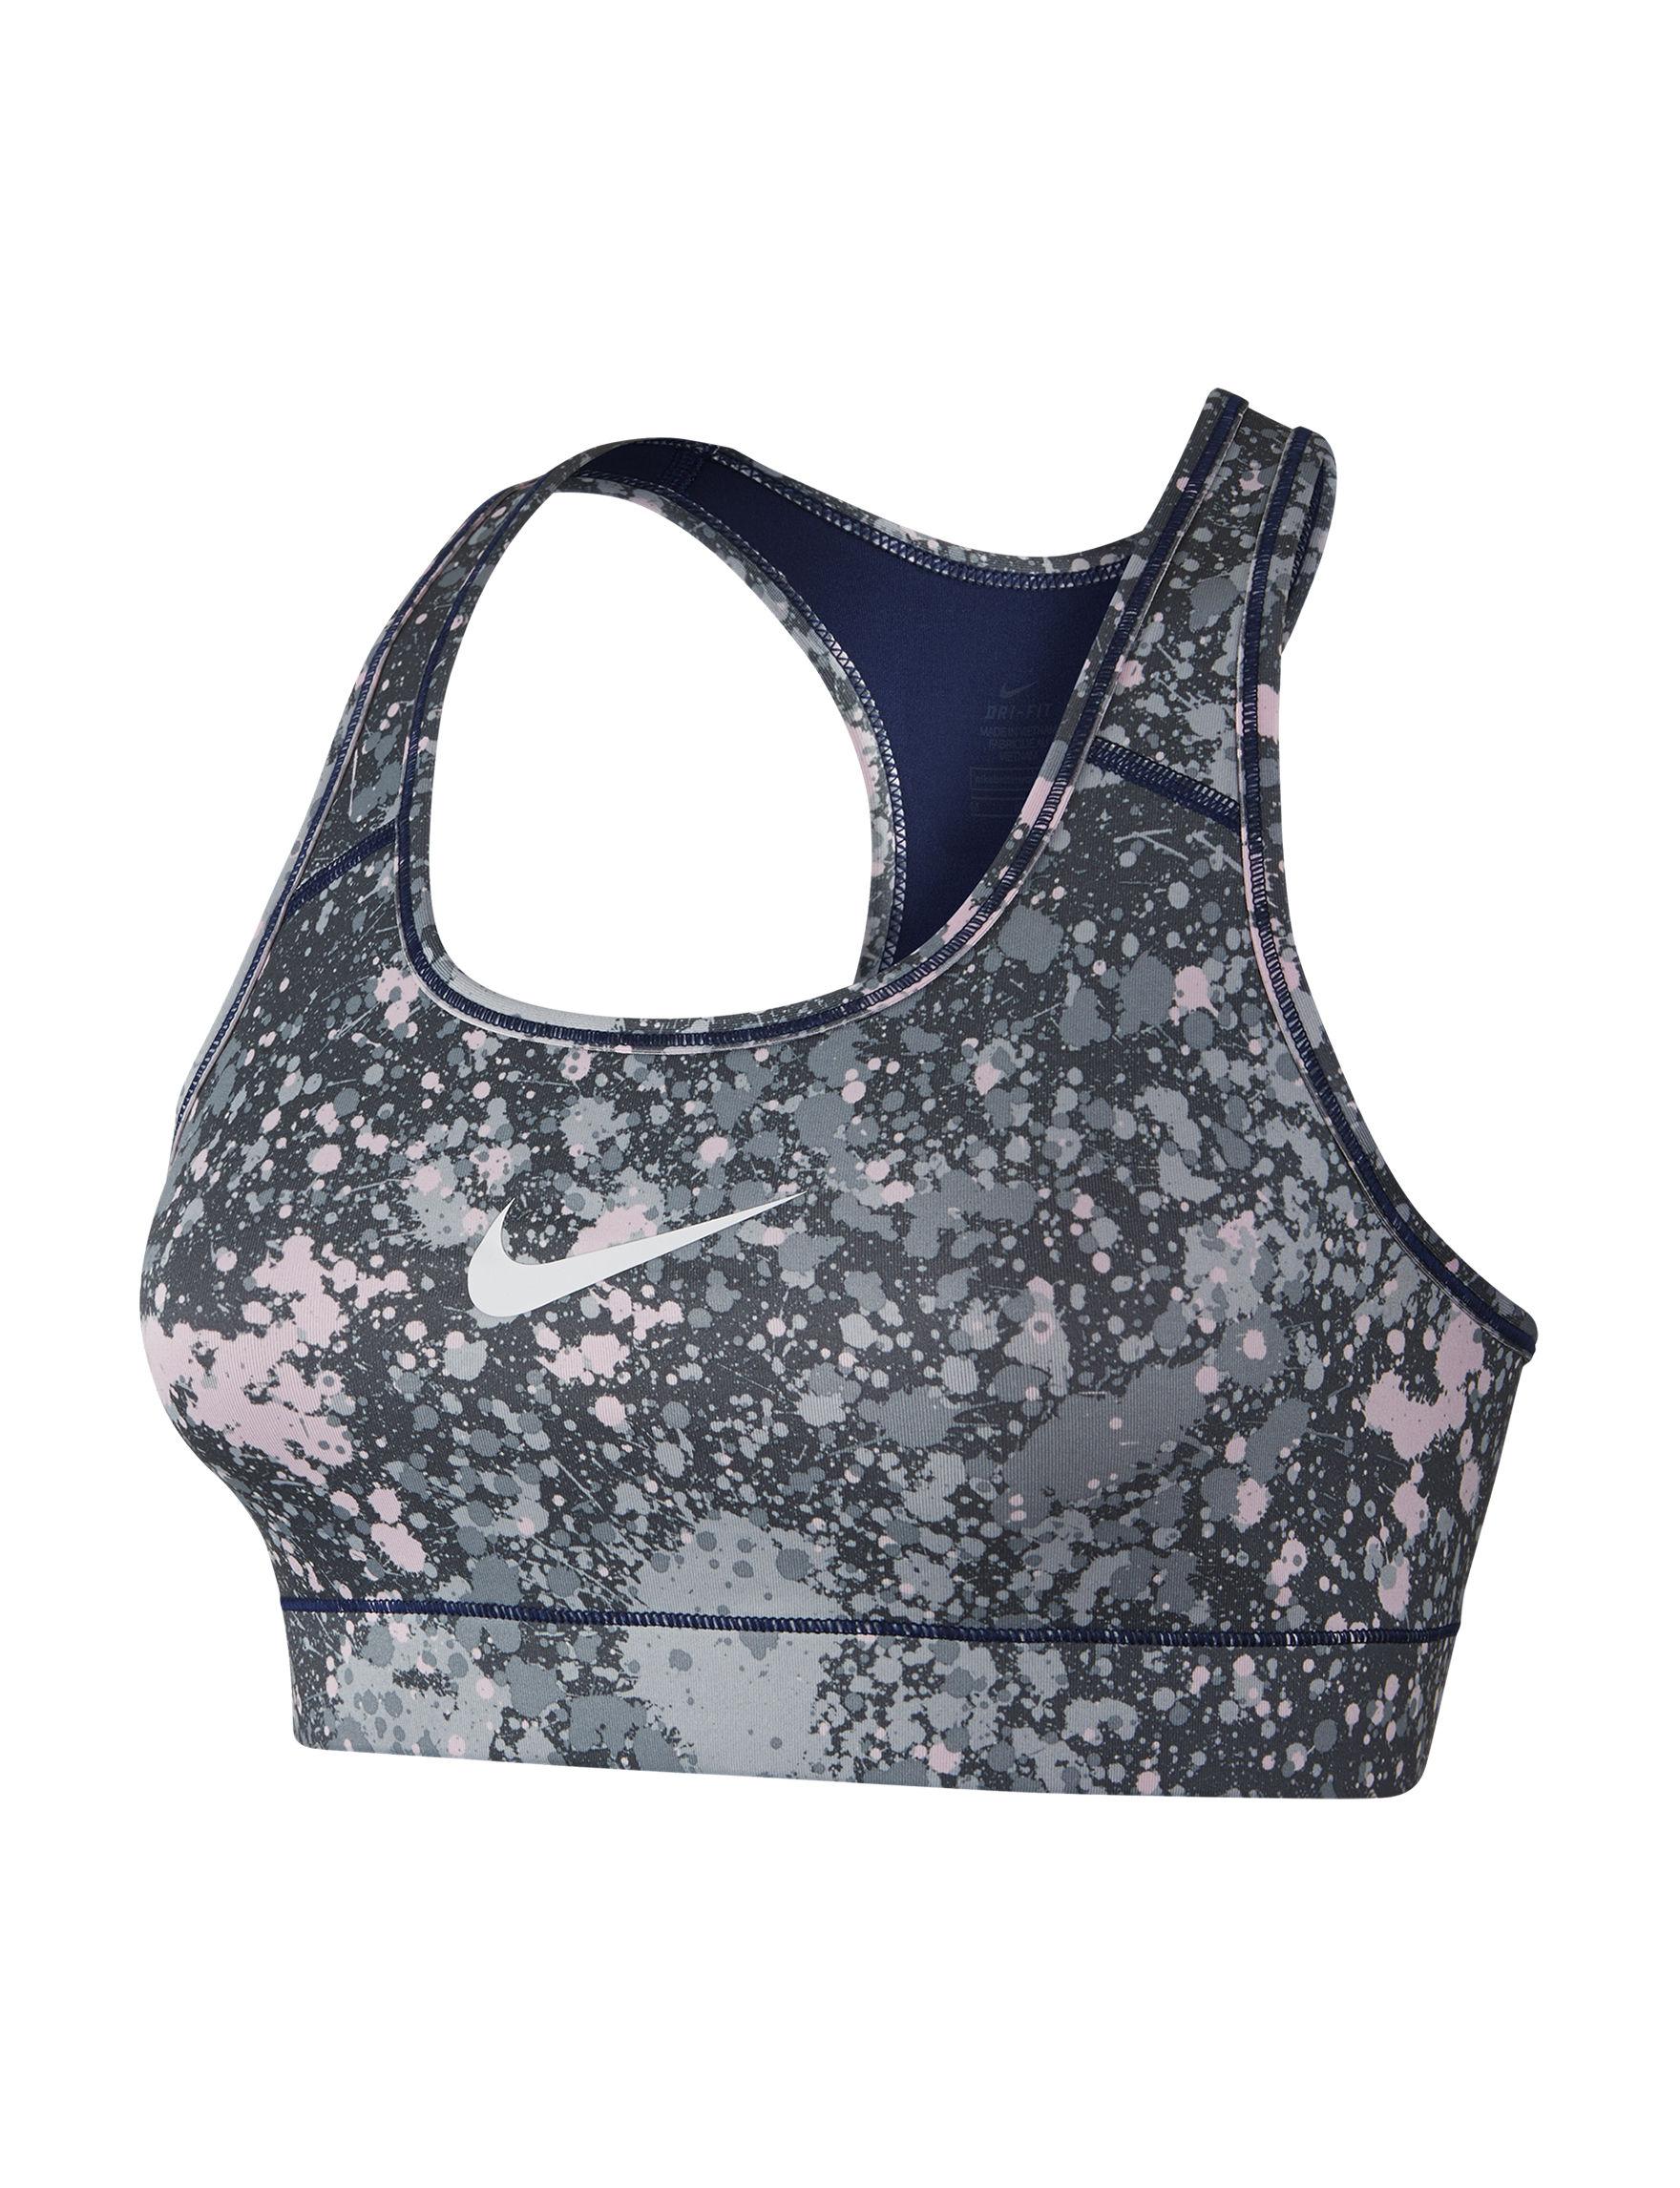 Nike Blue Bras Sports Bra